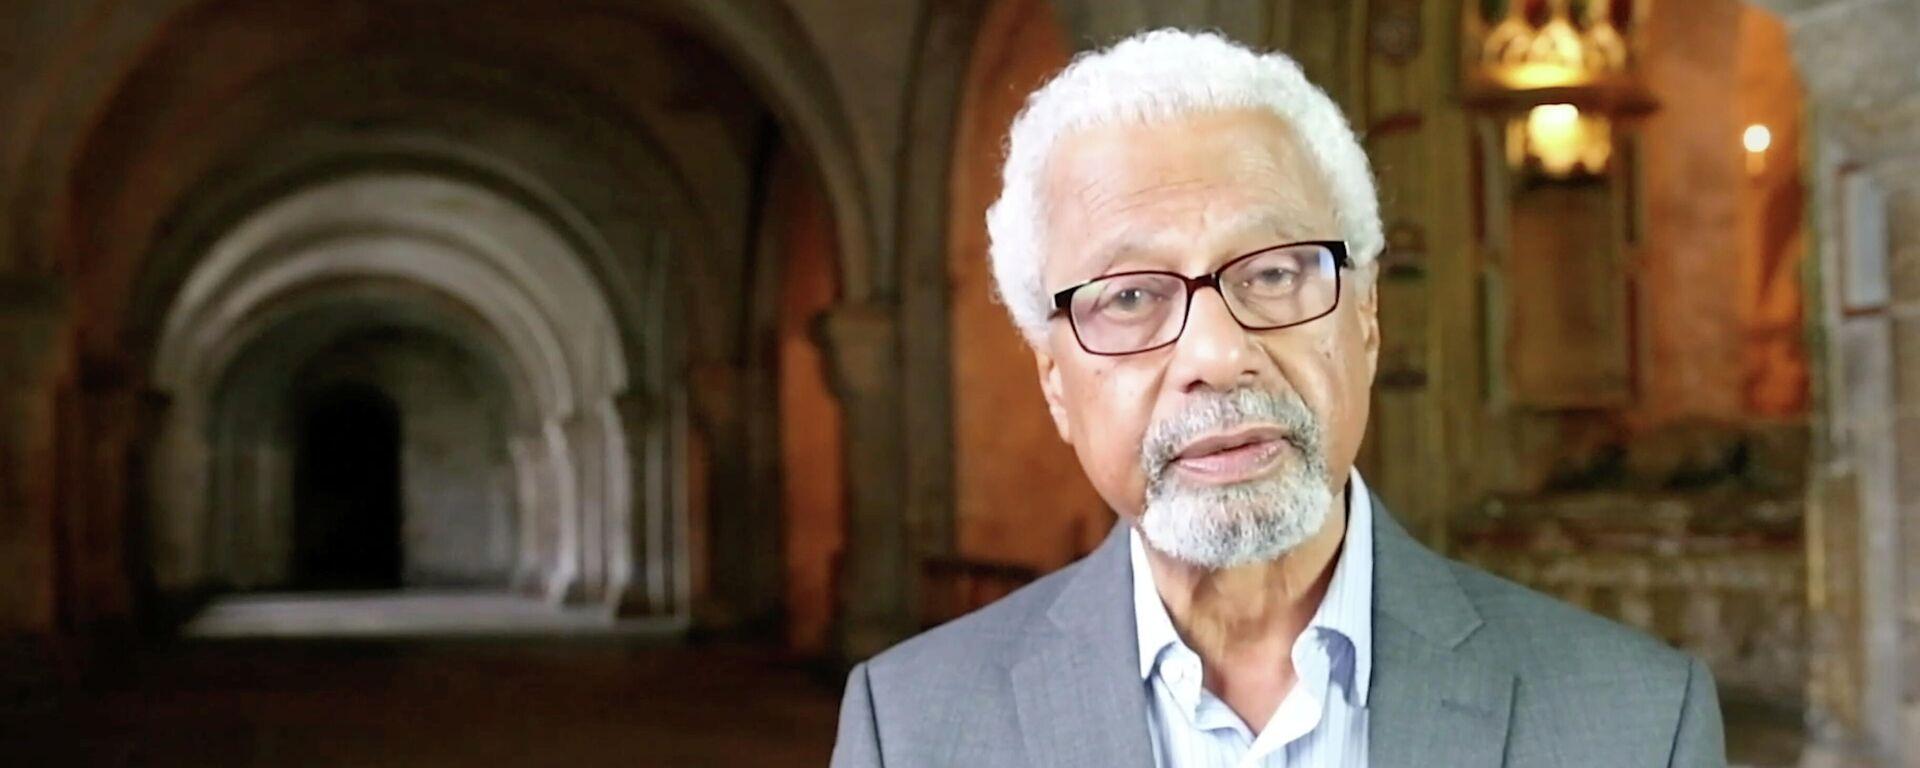 Abdulrazak Gurnah, novelista tanzano, quien recibió el Premio Nobel de Literatura 2021 - Sputnik Mundo, 1920, 07.10.2021